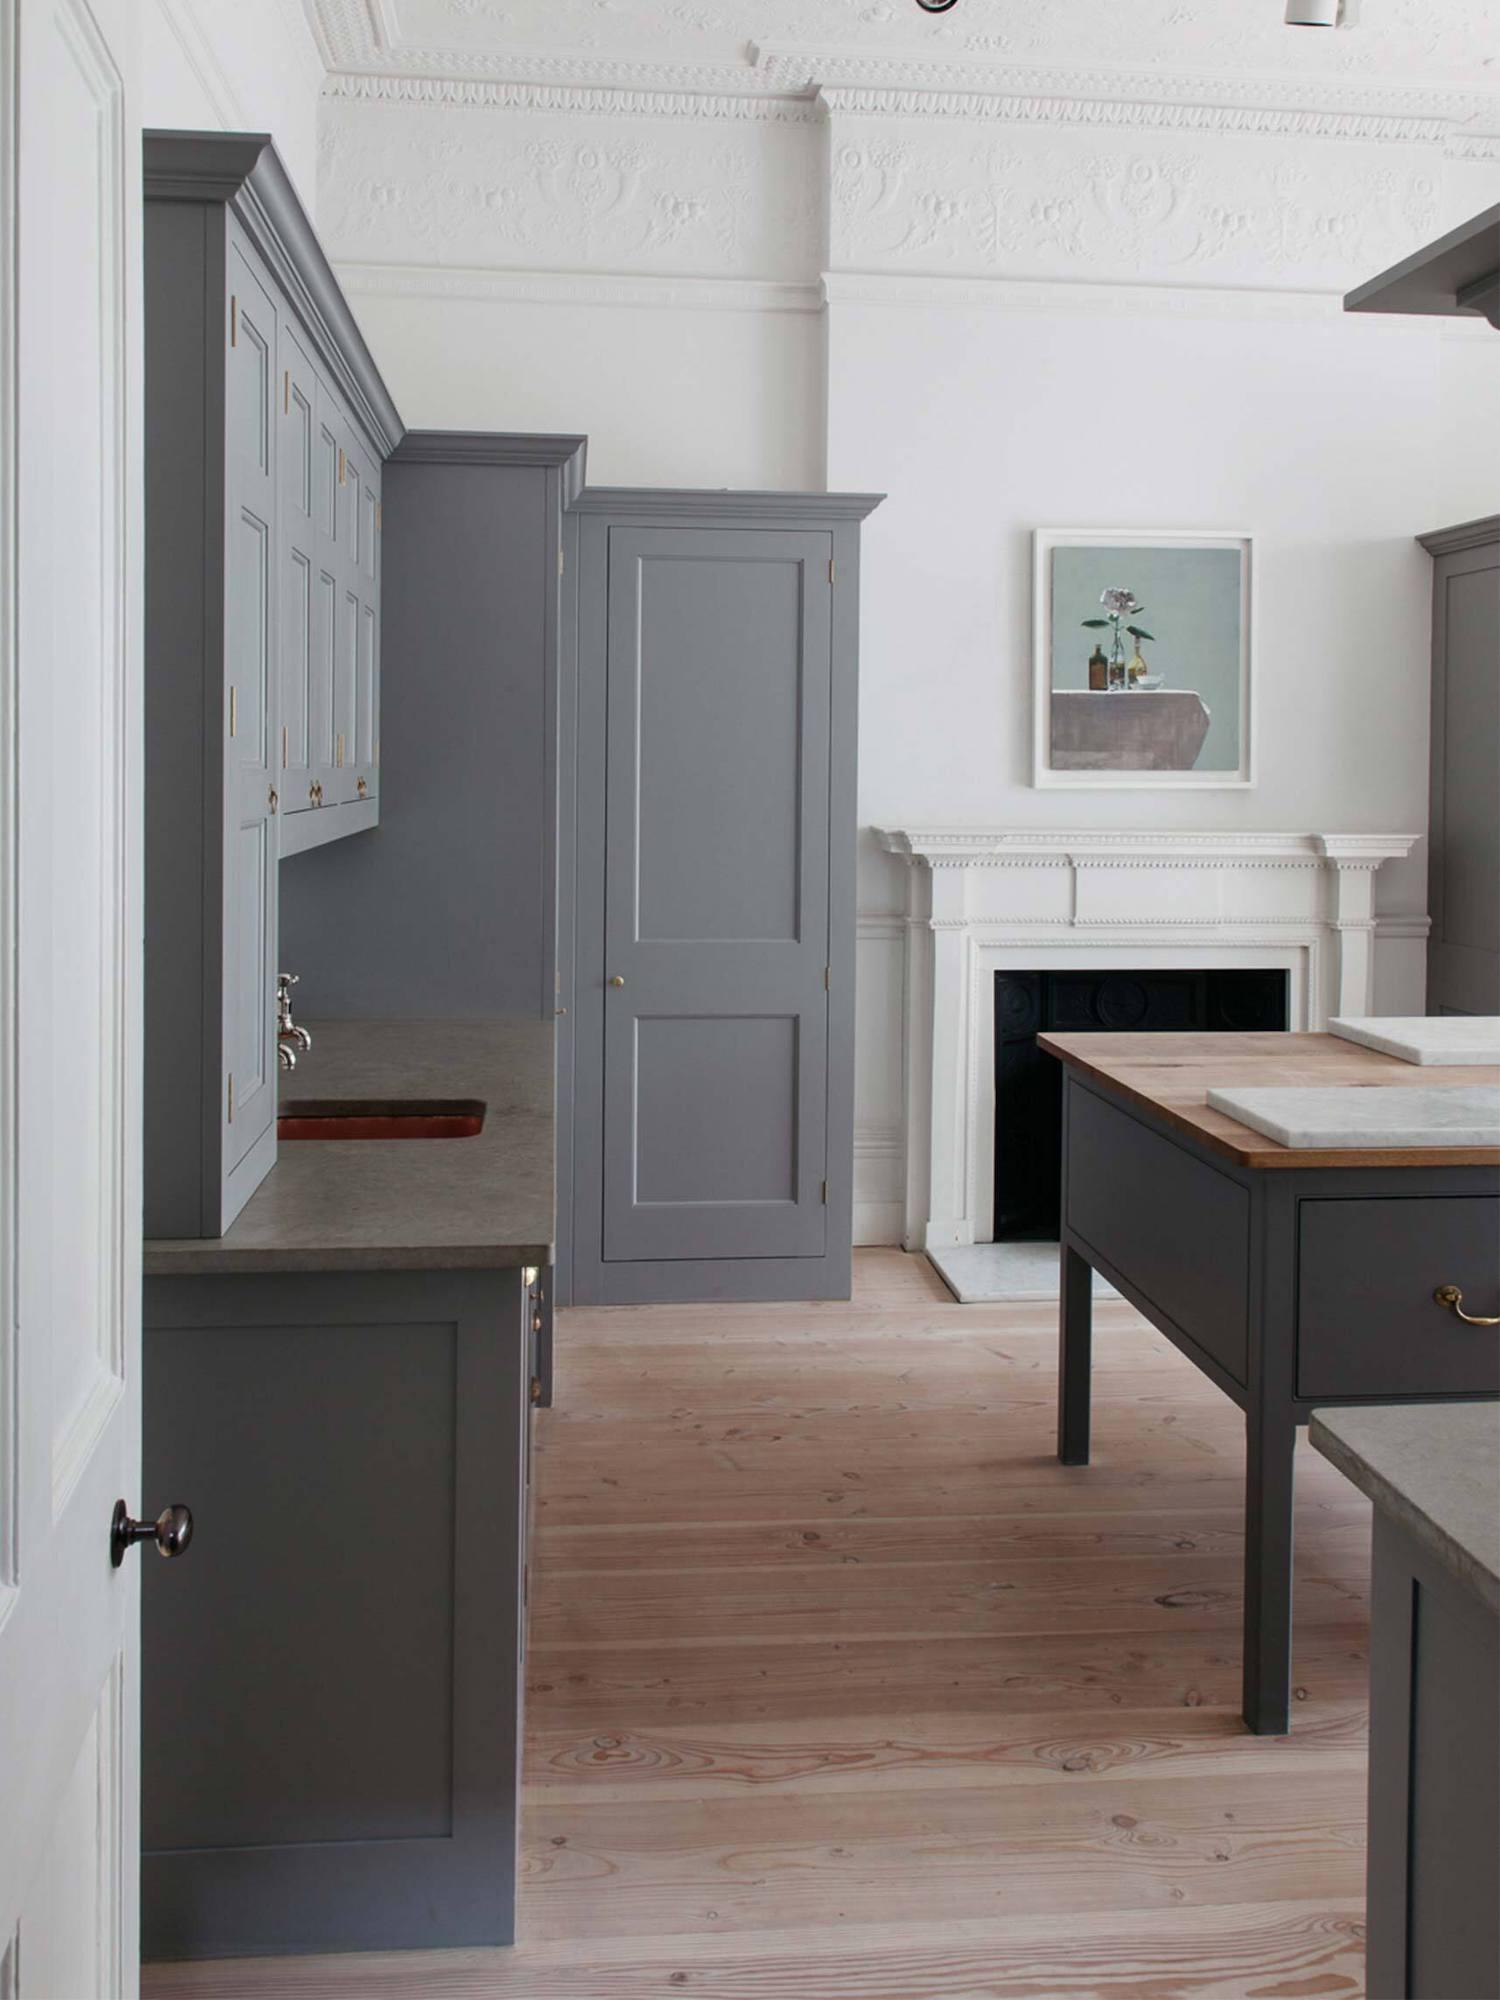 est living plain english kitchen 02